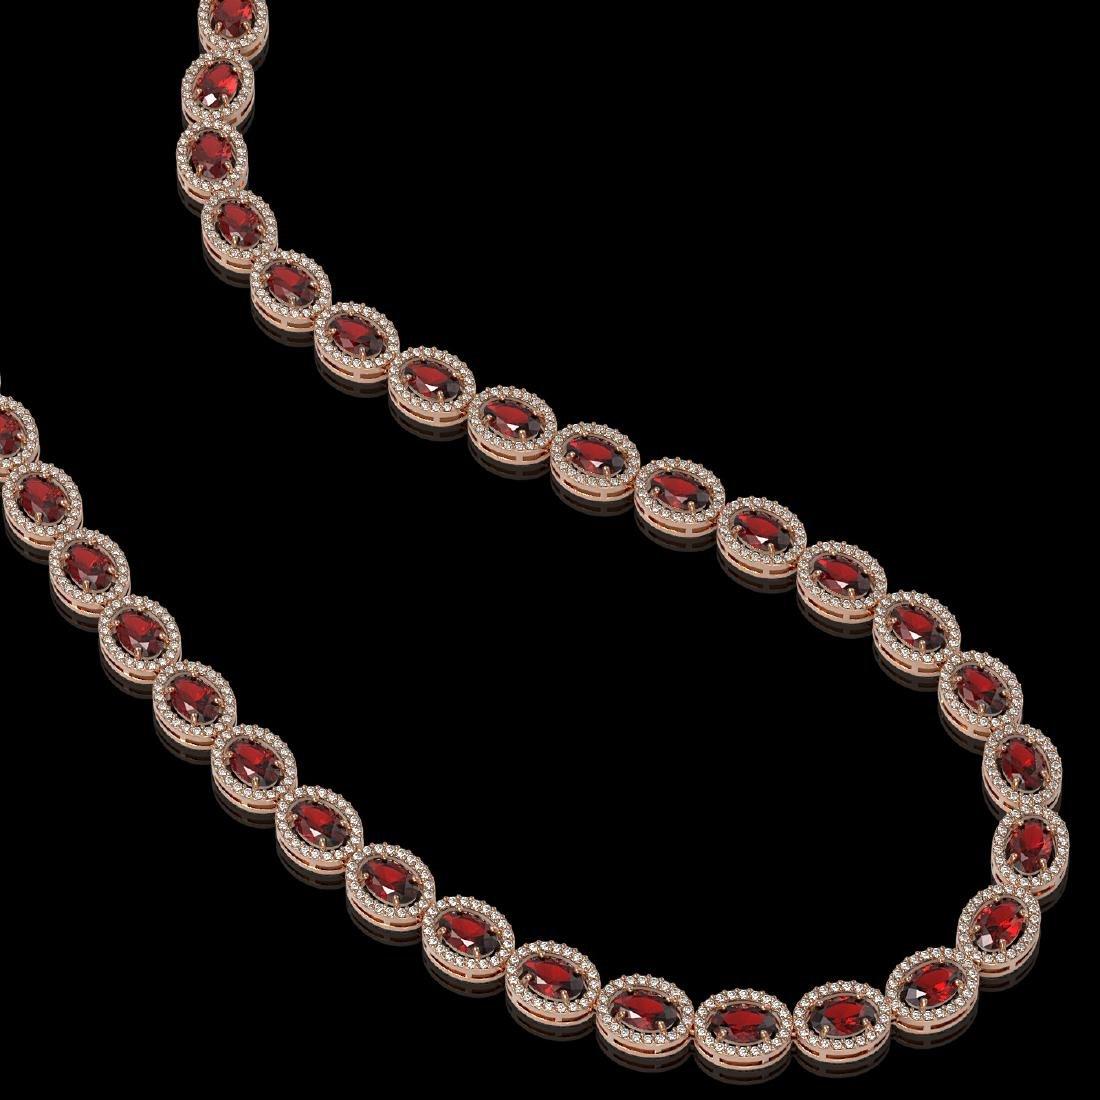 32.82 CTW Garnet & Diamond Halo Necklace 10K Rose Gold - 2